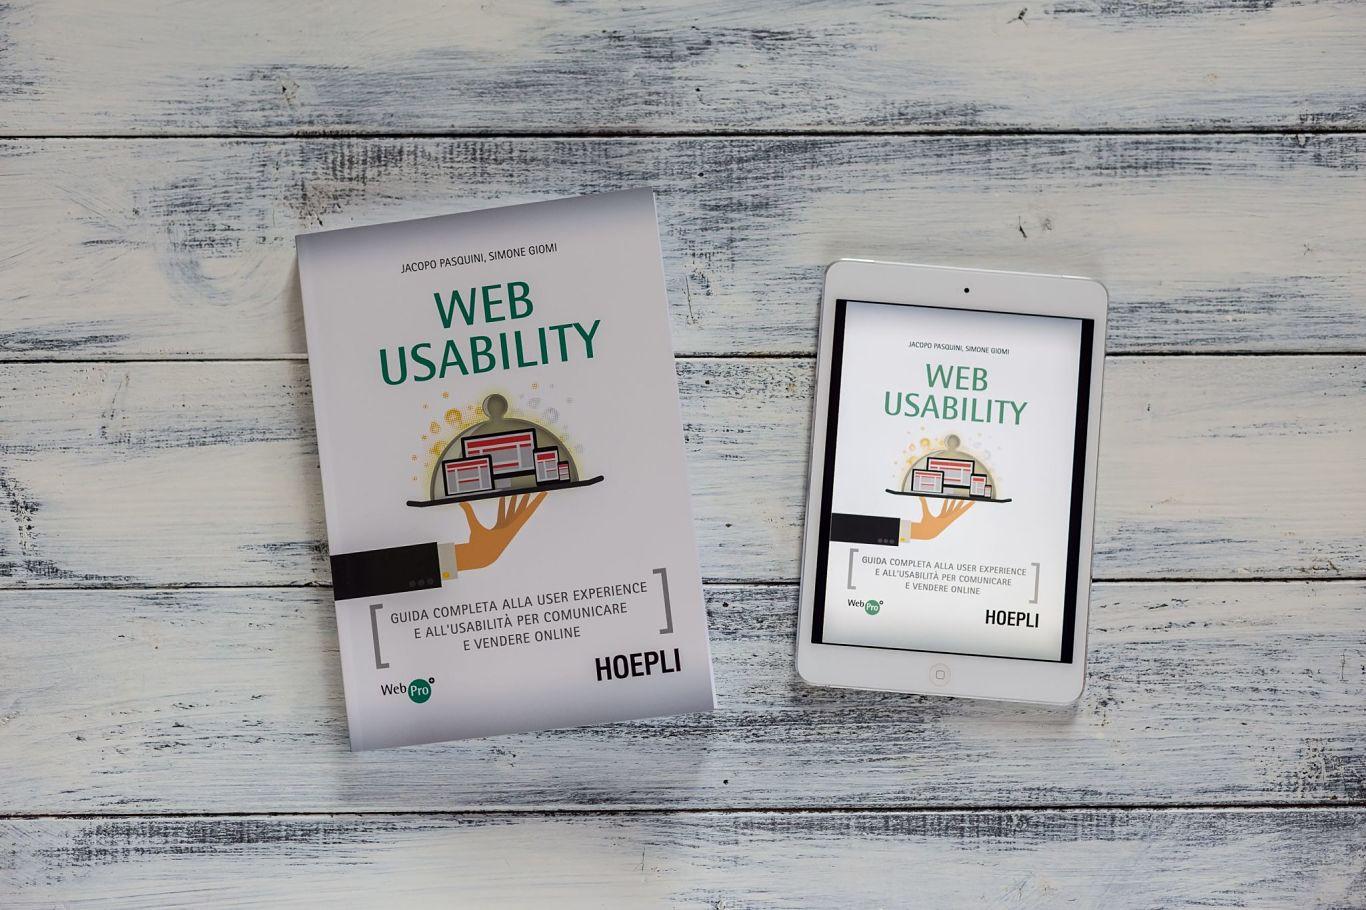 libro hoepli web usability jacopo pasquini simone giomi